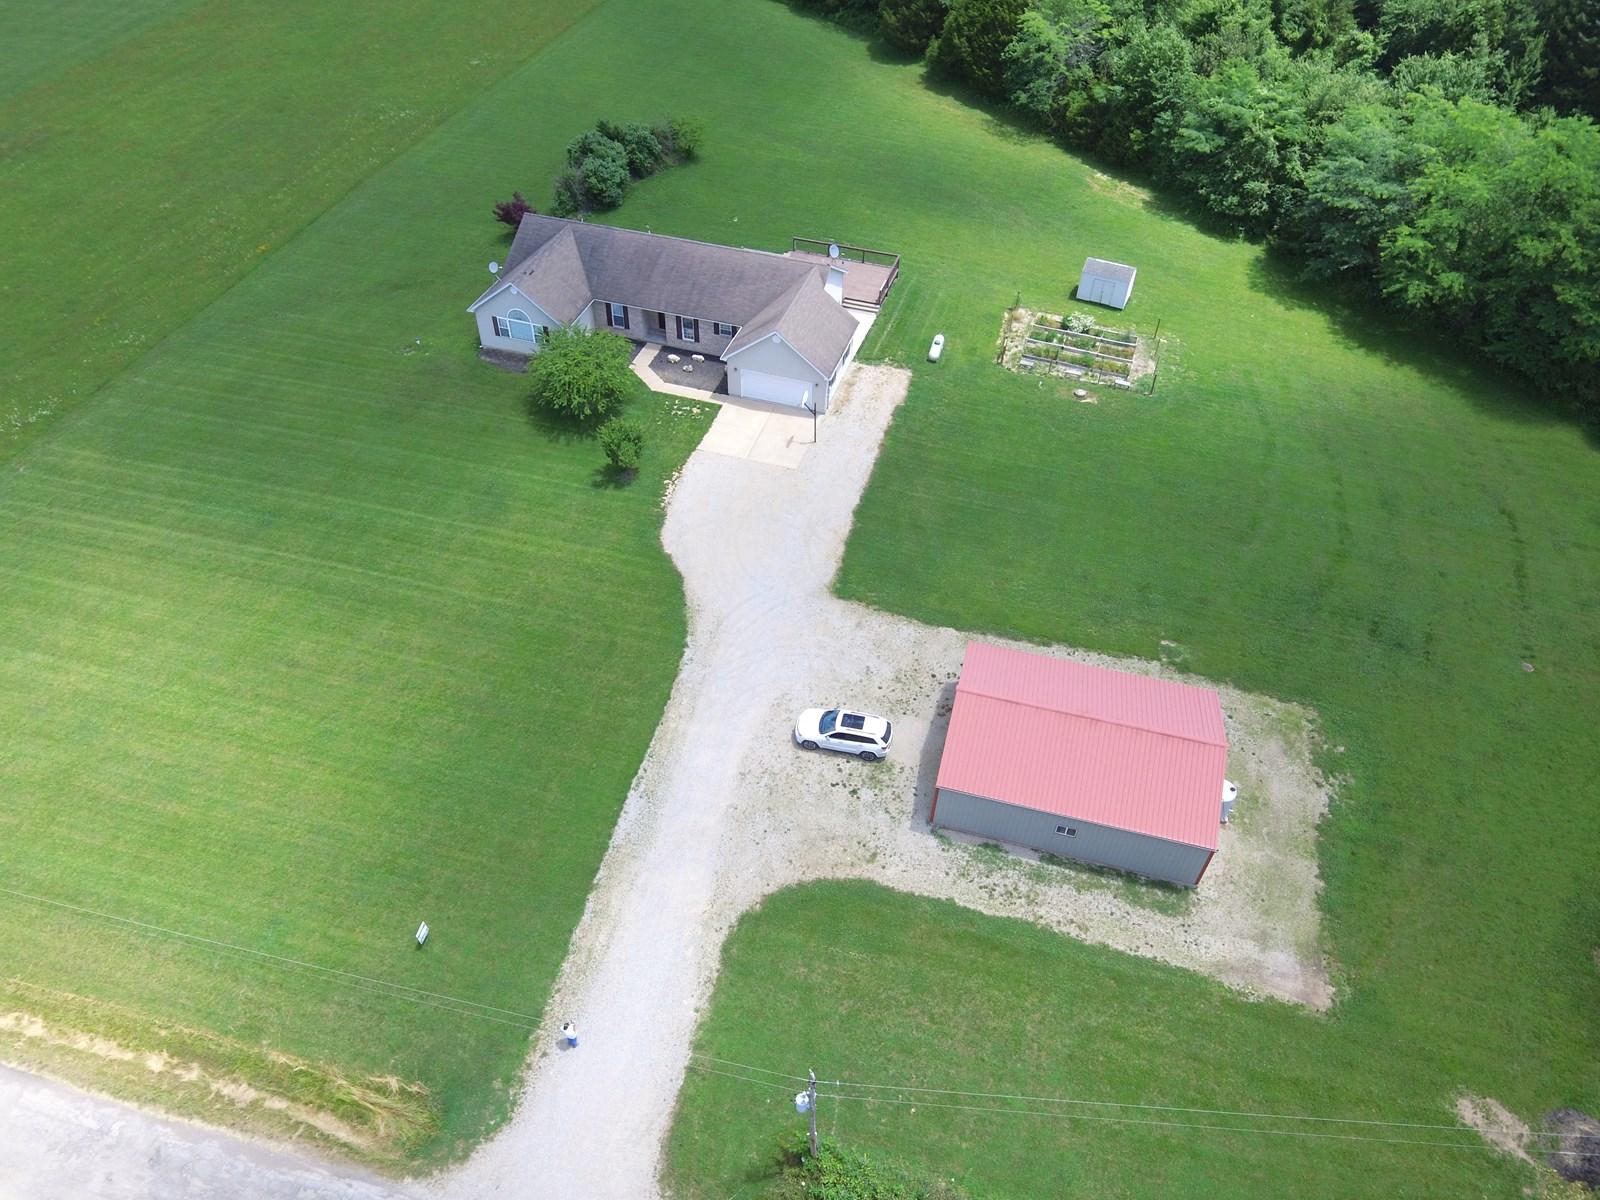 4-BR,2-BA COUNTRY HOME IN FARMINGTON SCHOOL DISTRICT